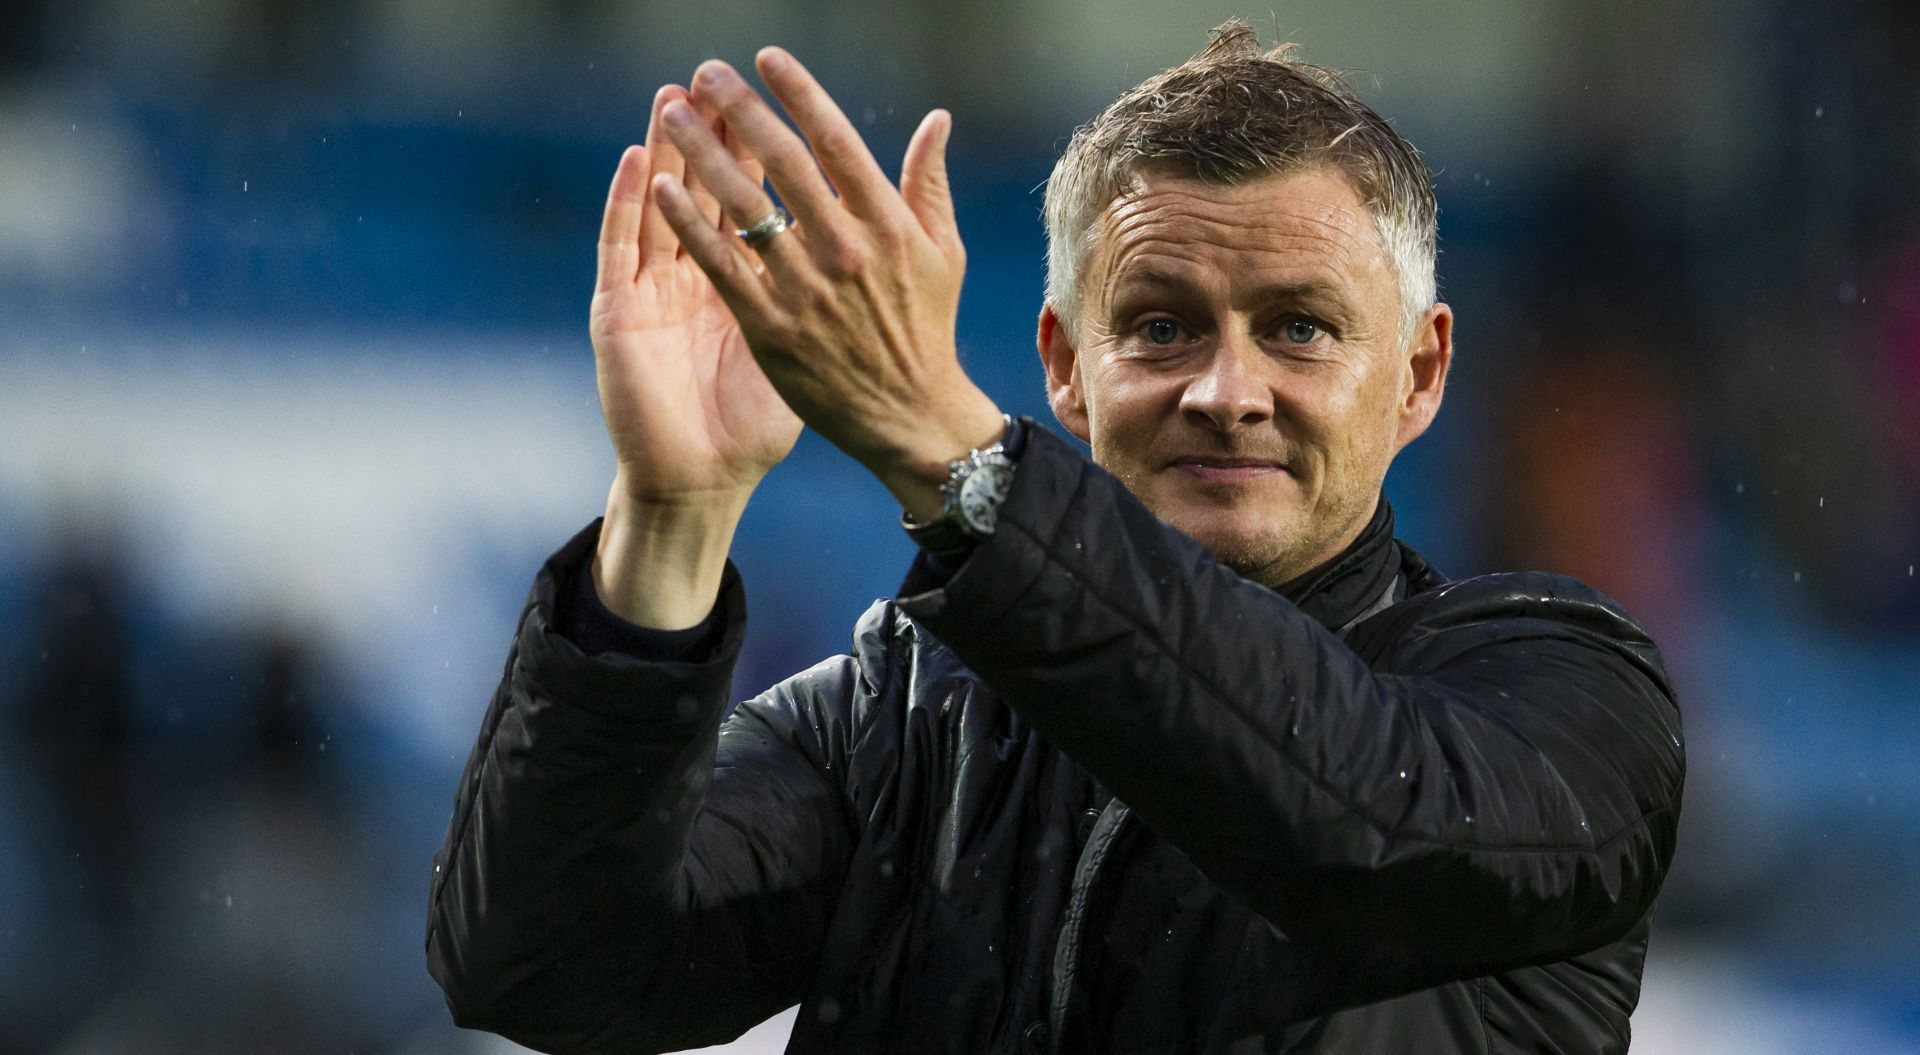 Solskjaer izjednačio rekord Busbyja, želi ostati na klupi Uniteda